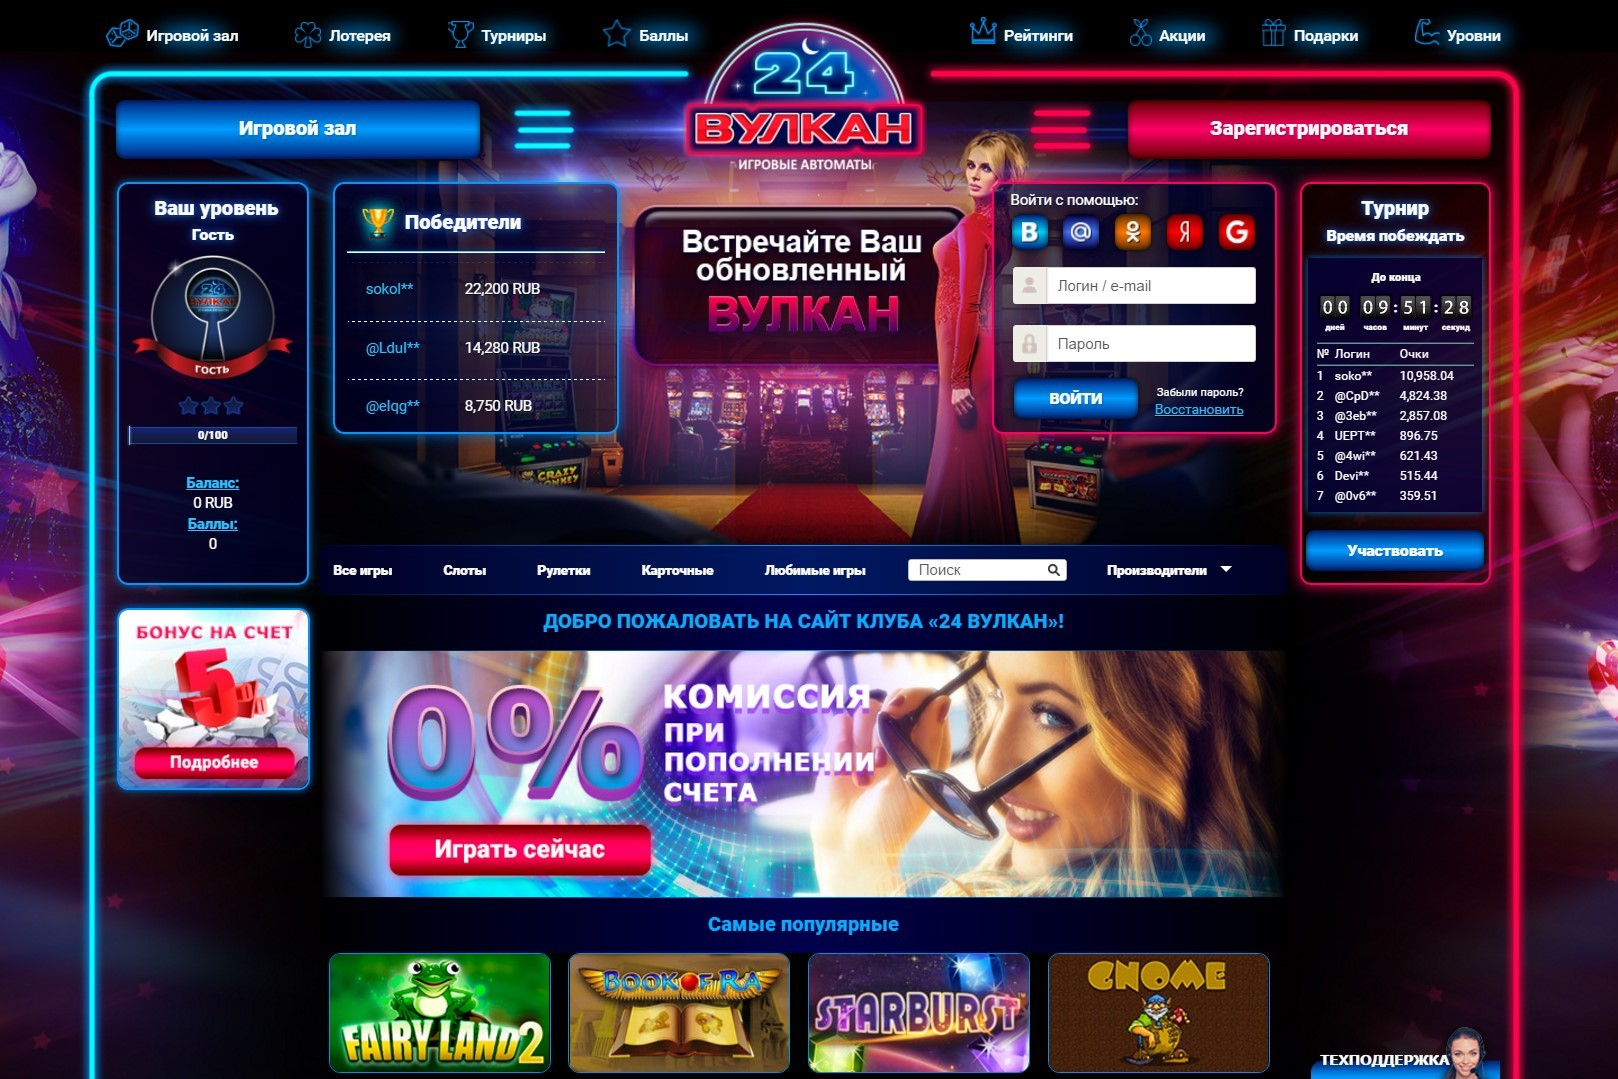 обзор онлайн казино vulcan 24 club